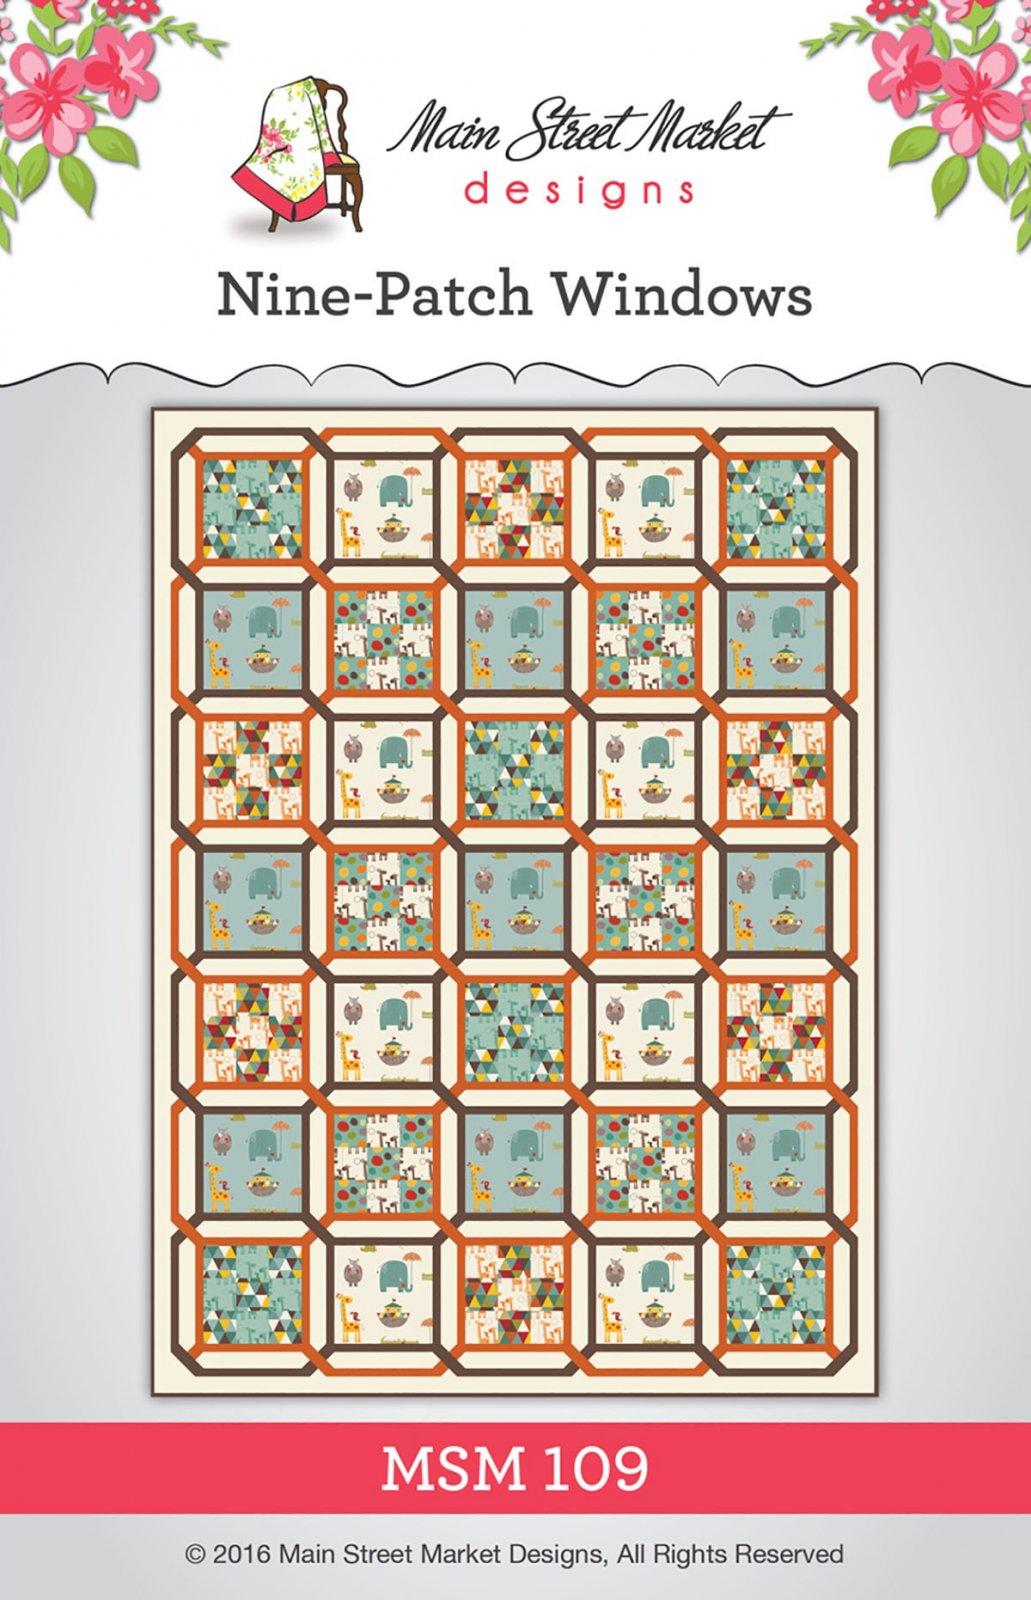 Nine-Patch Windows